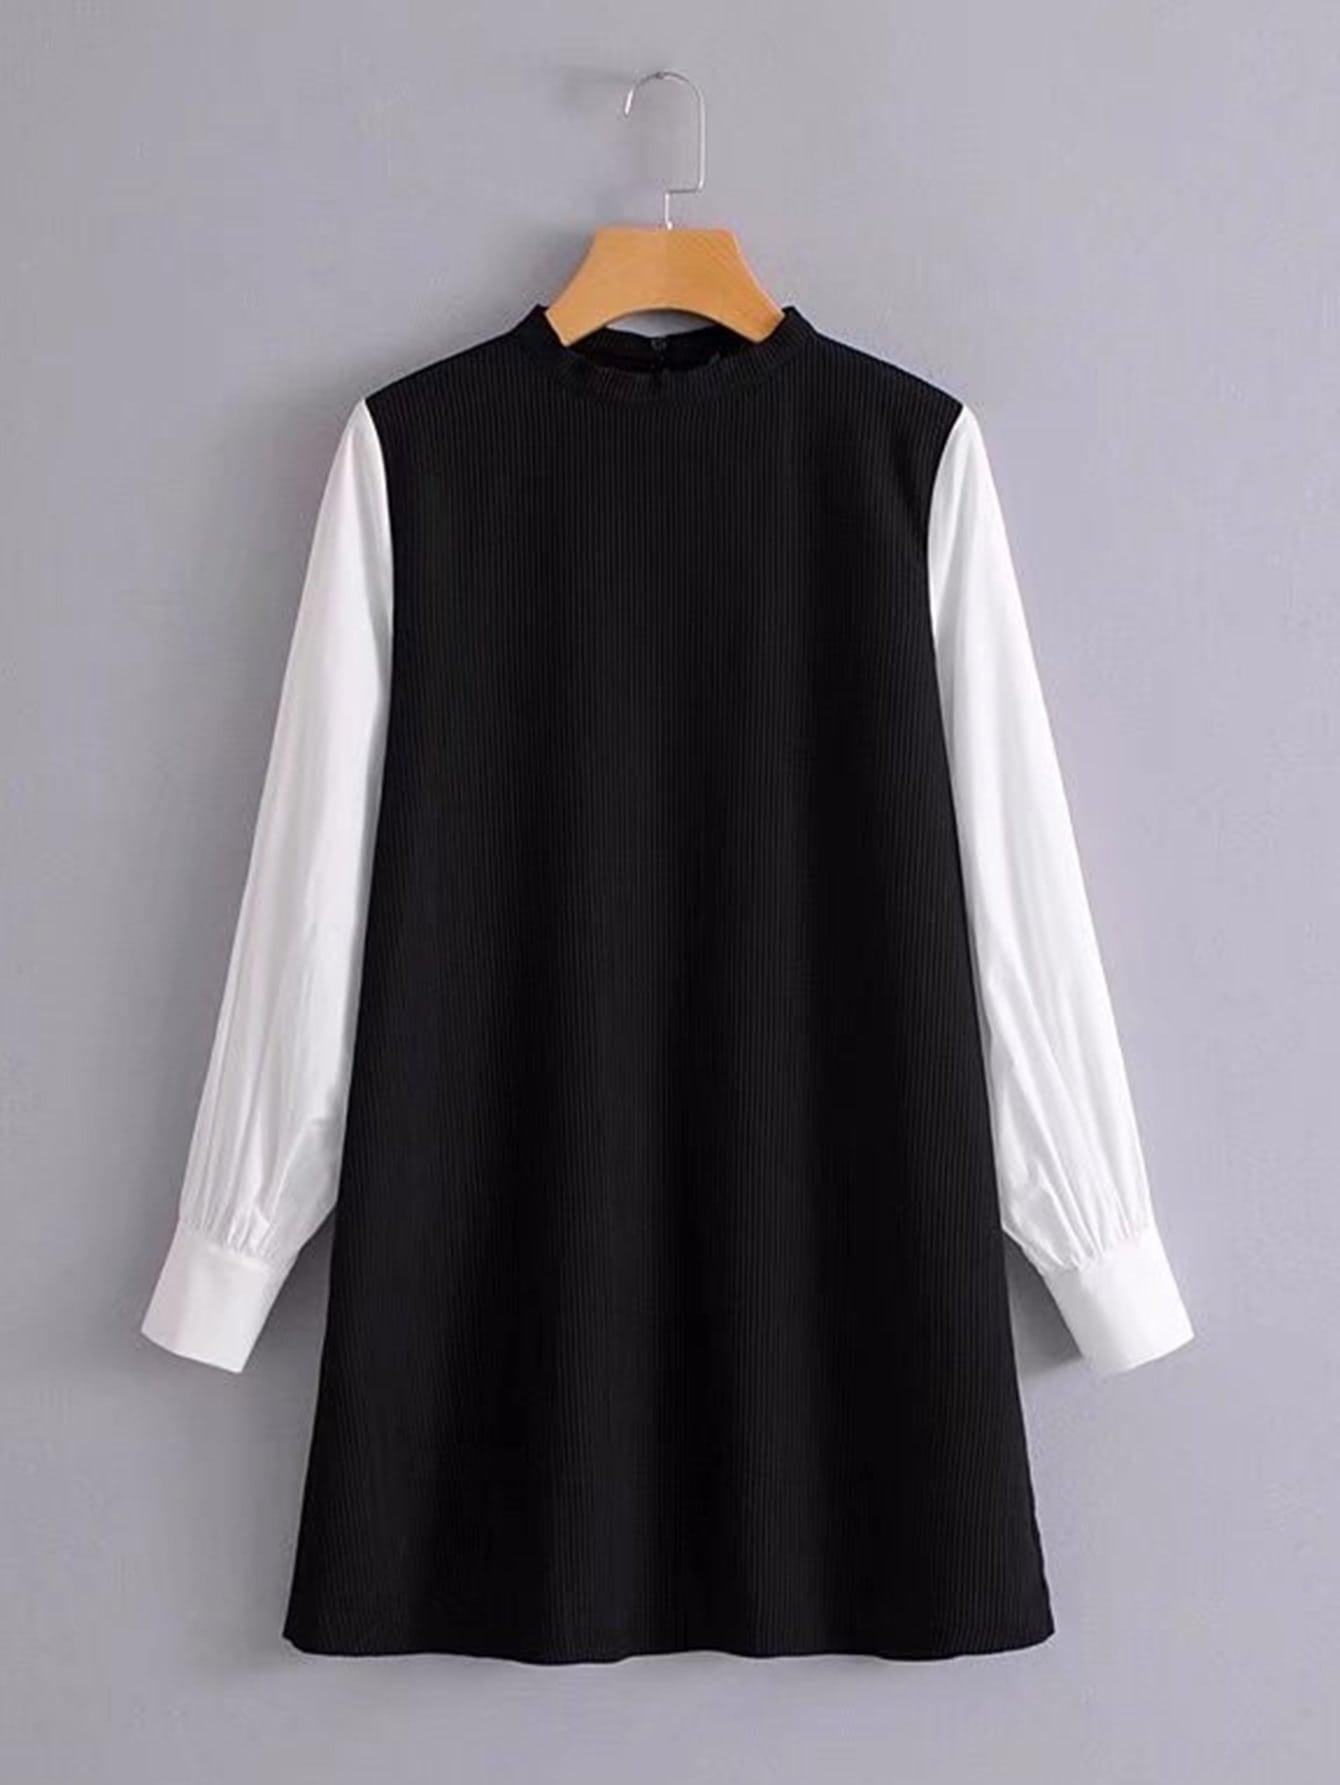 Contrast Sleeve Rib Dress dress171116205